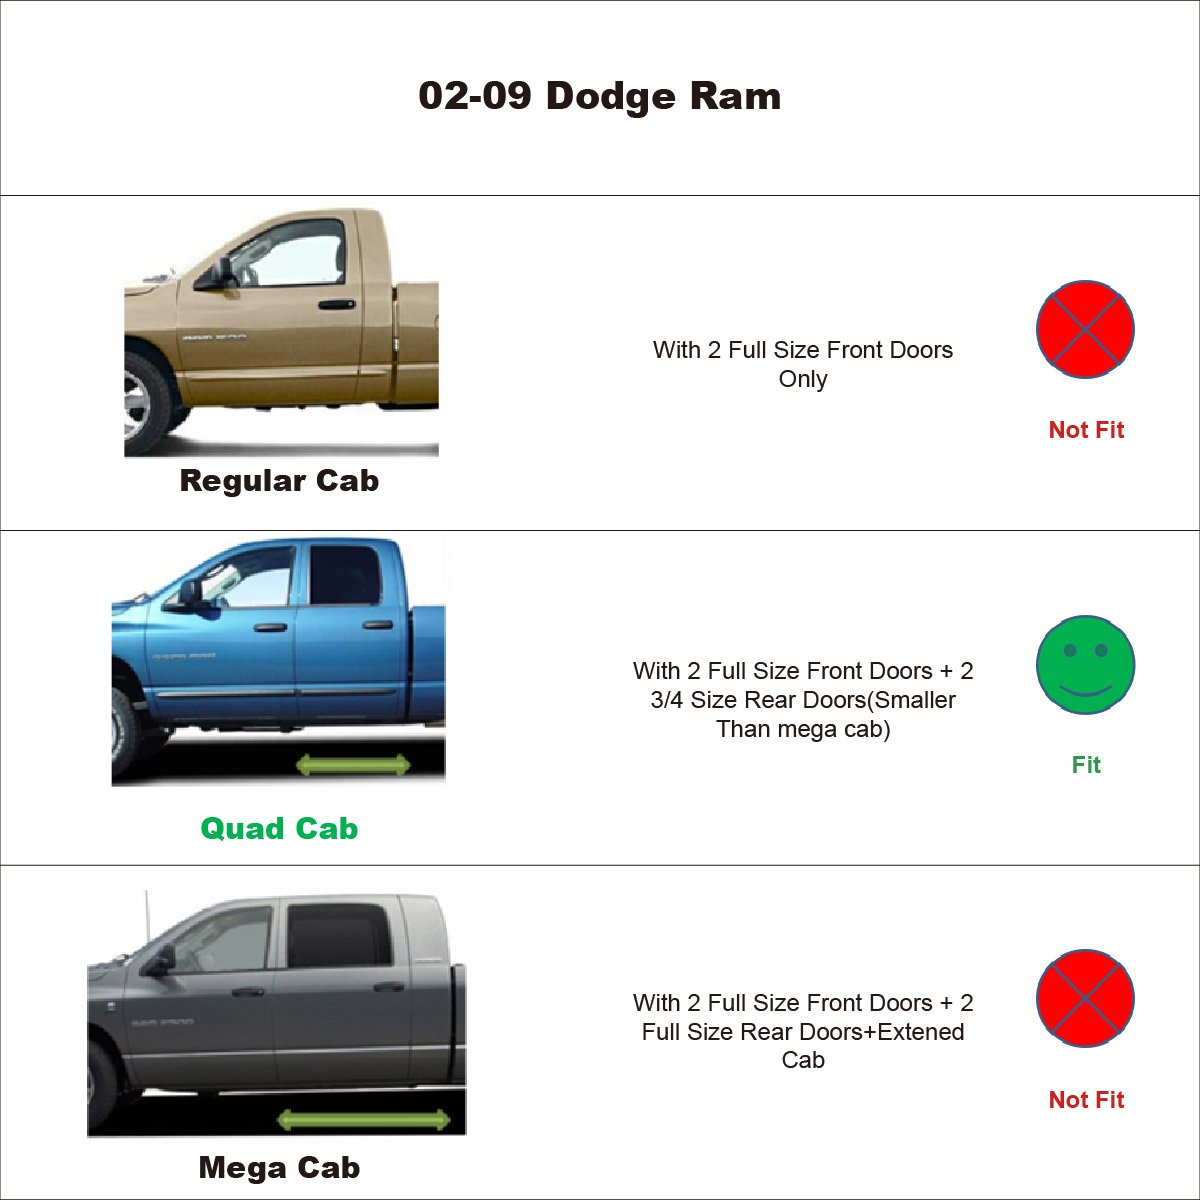 IINAWO 4pcs Front Rear Smoke Sun Rain Guard Vent Shade Window Visors Fit 02-08 Dodge Ram 1500 Quad Crew Cab 03-09 Ram 2500 3500 Quad Crew Cab